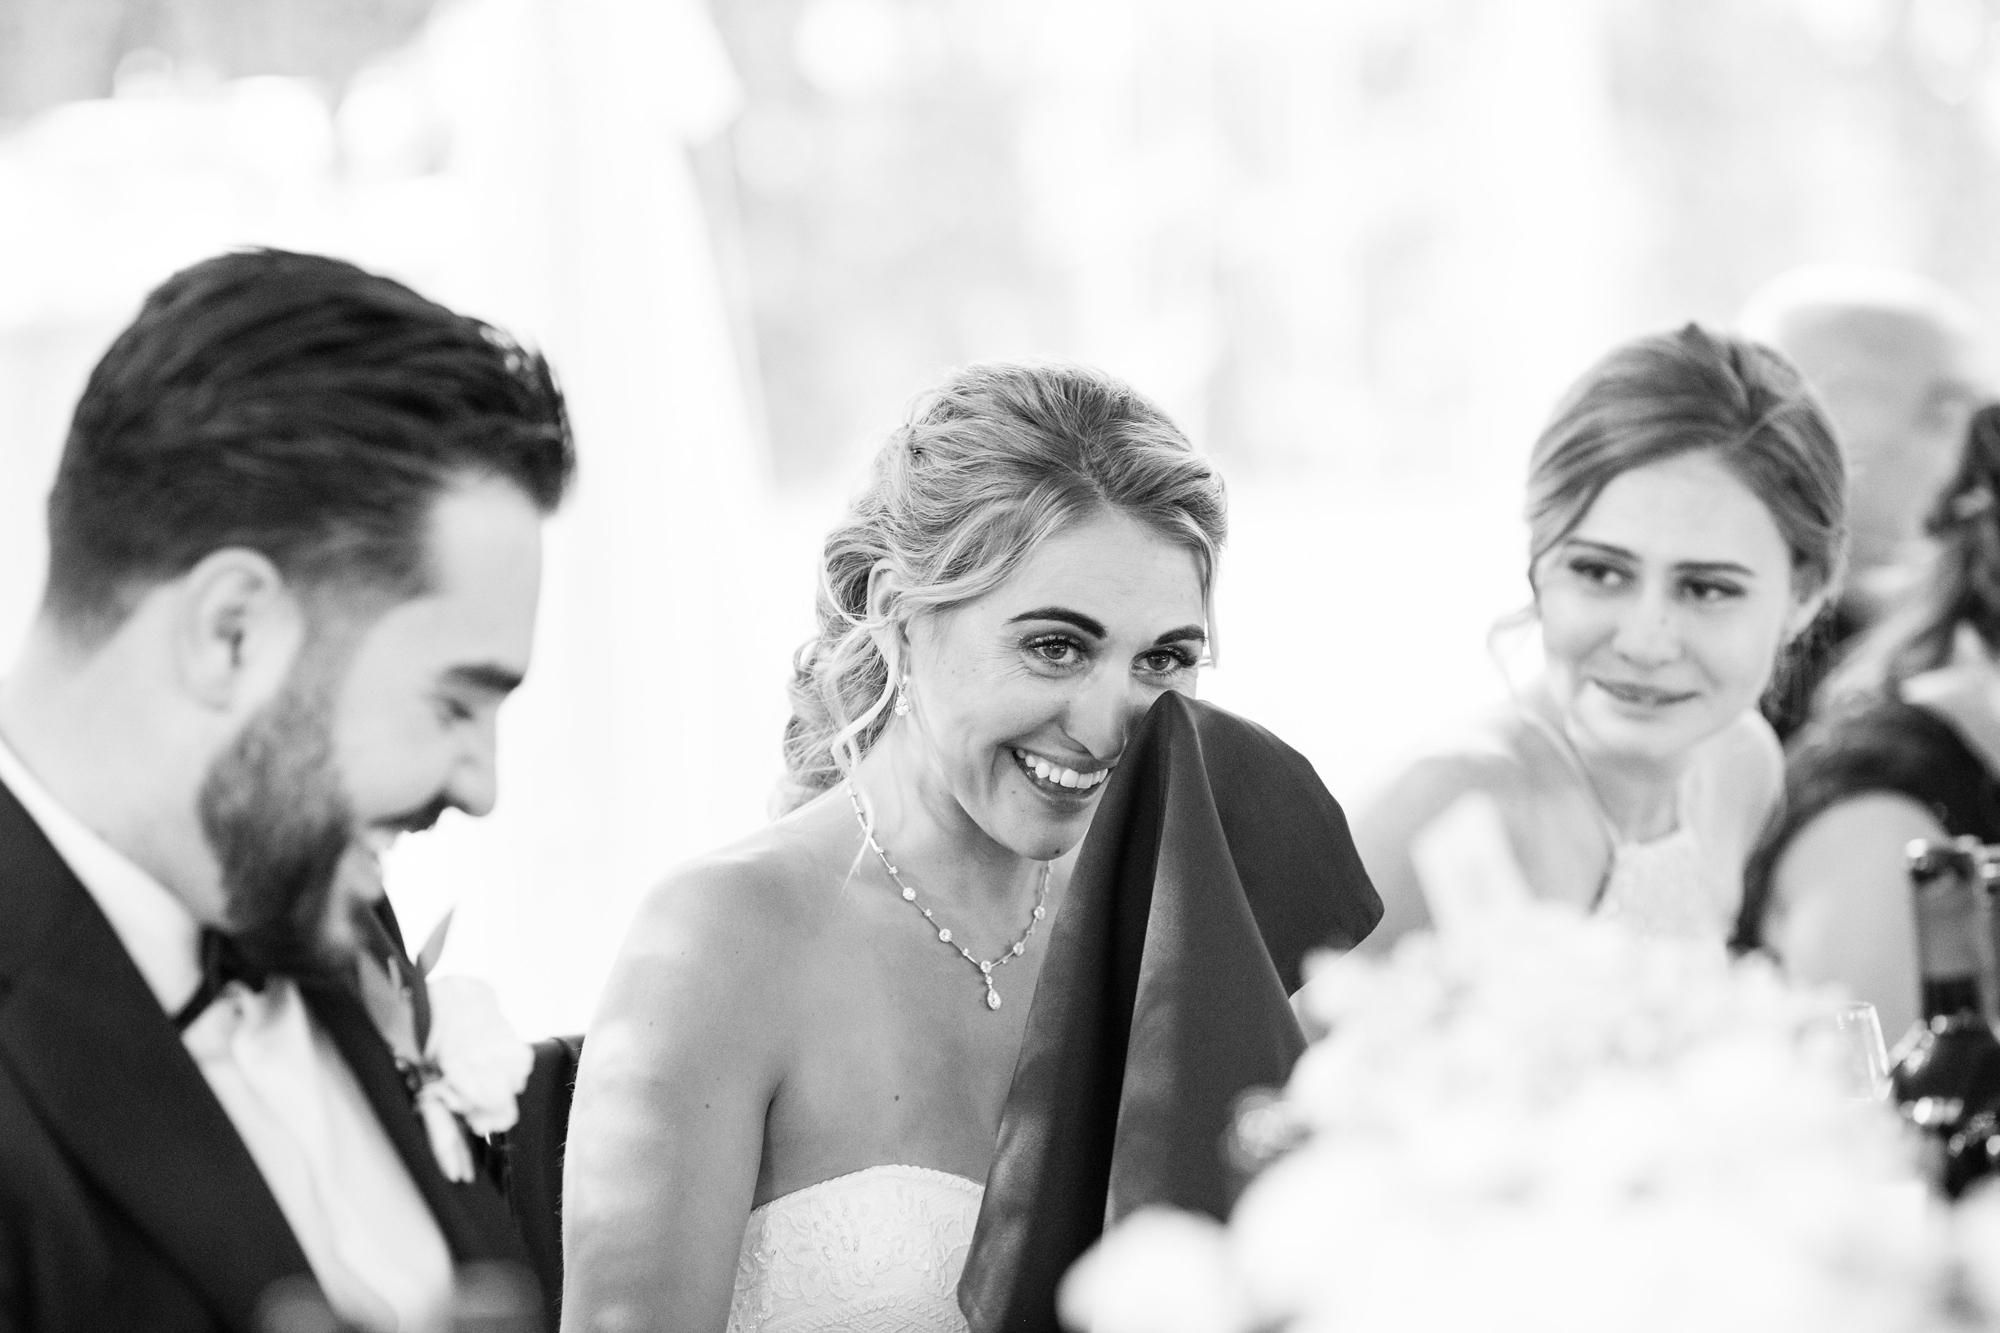 greek-wedding-salt-lake-city-utah-46.jpg